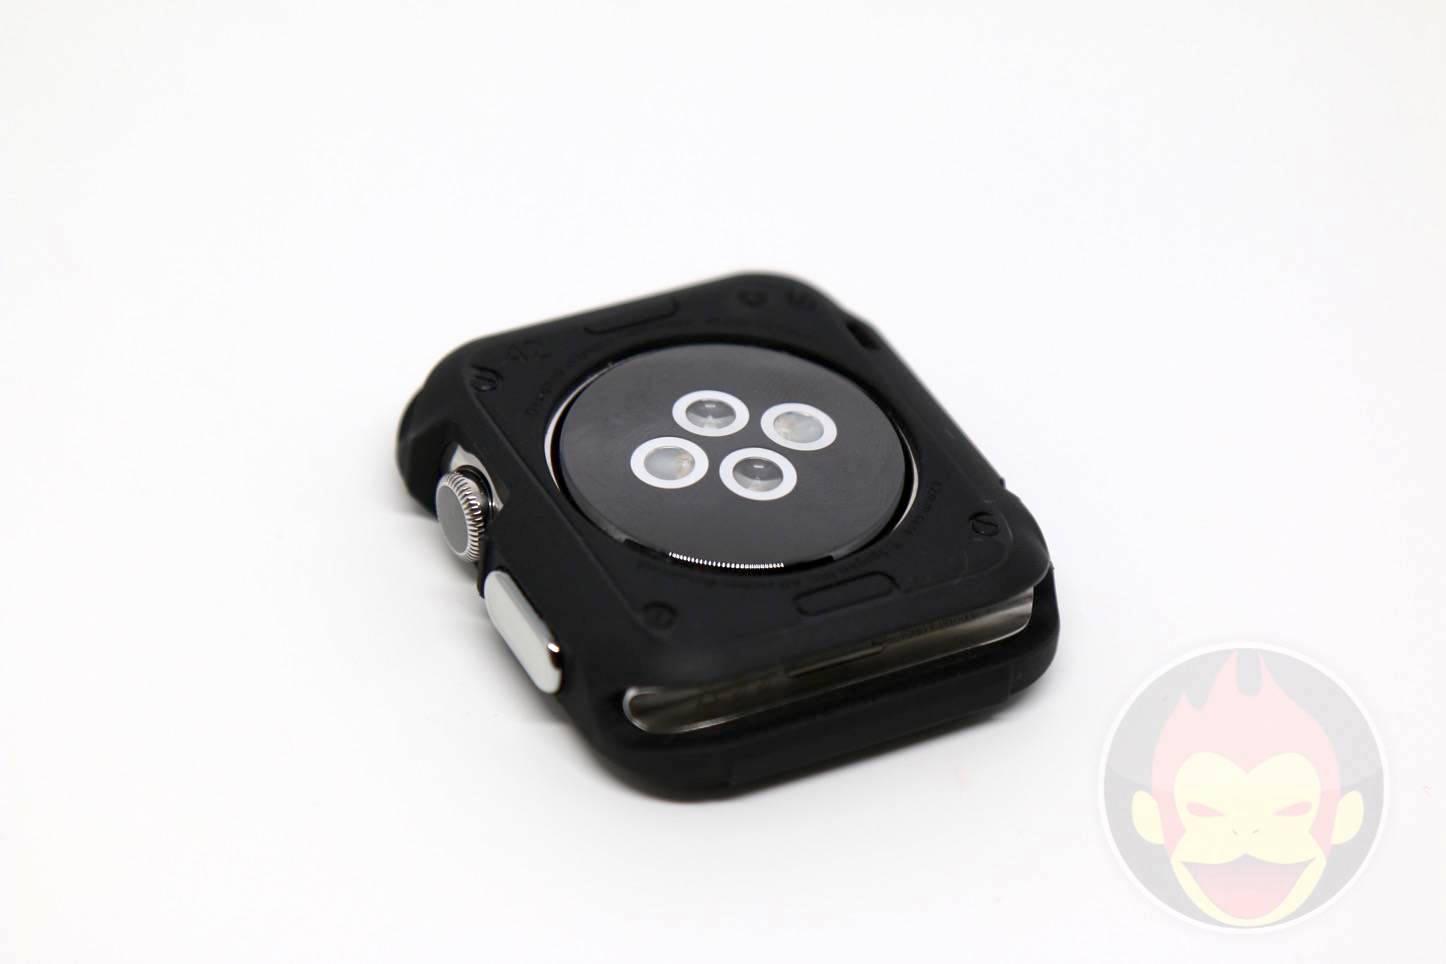 Spigen-Rugged-Armor-Apple-Watch-Case-13.JPG